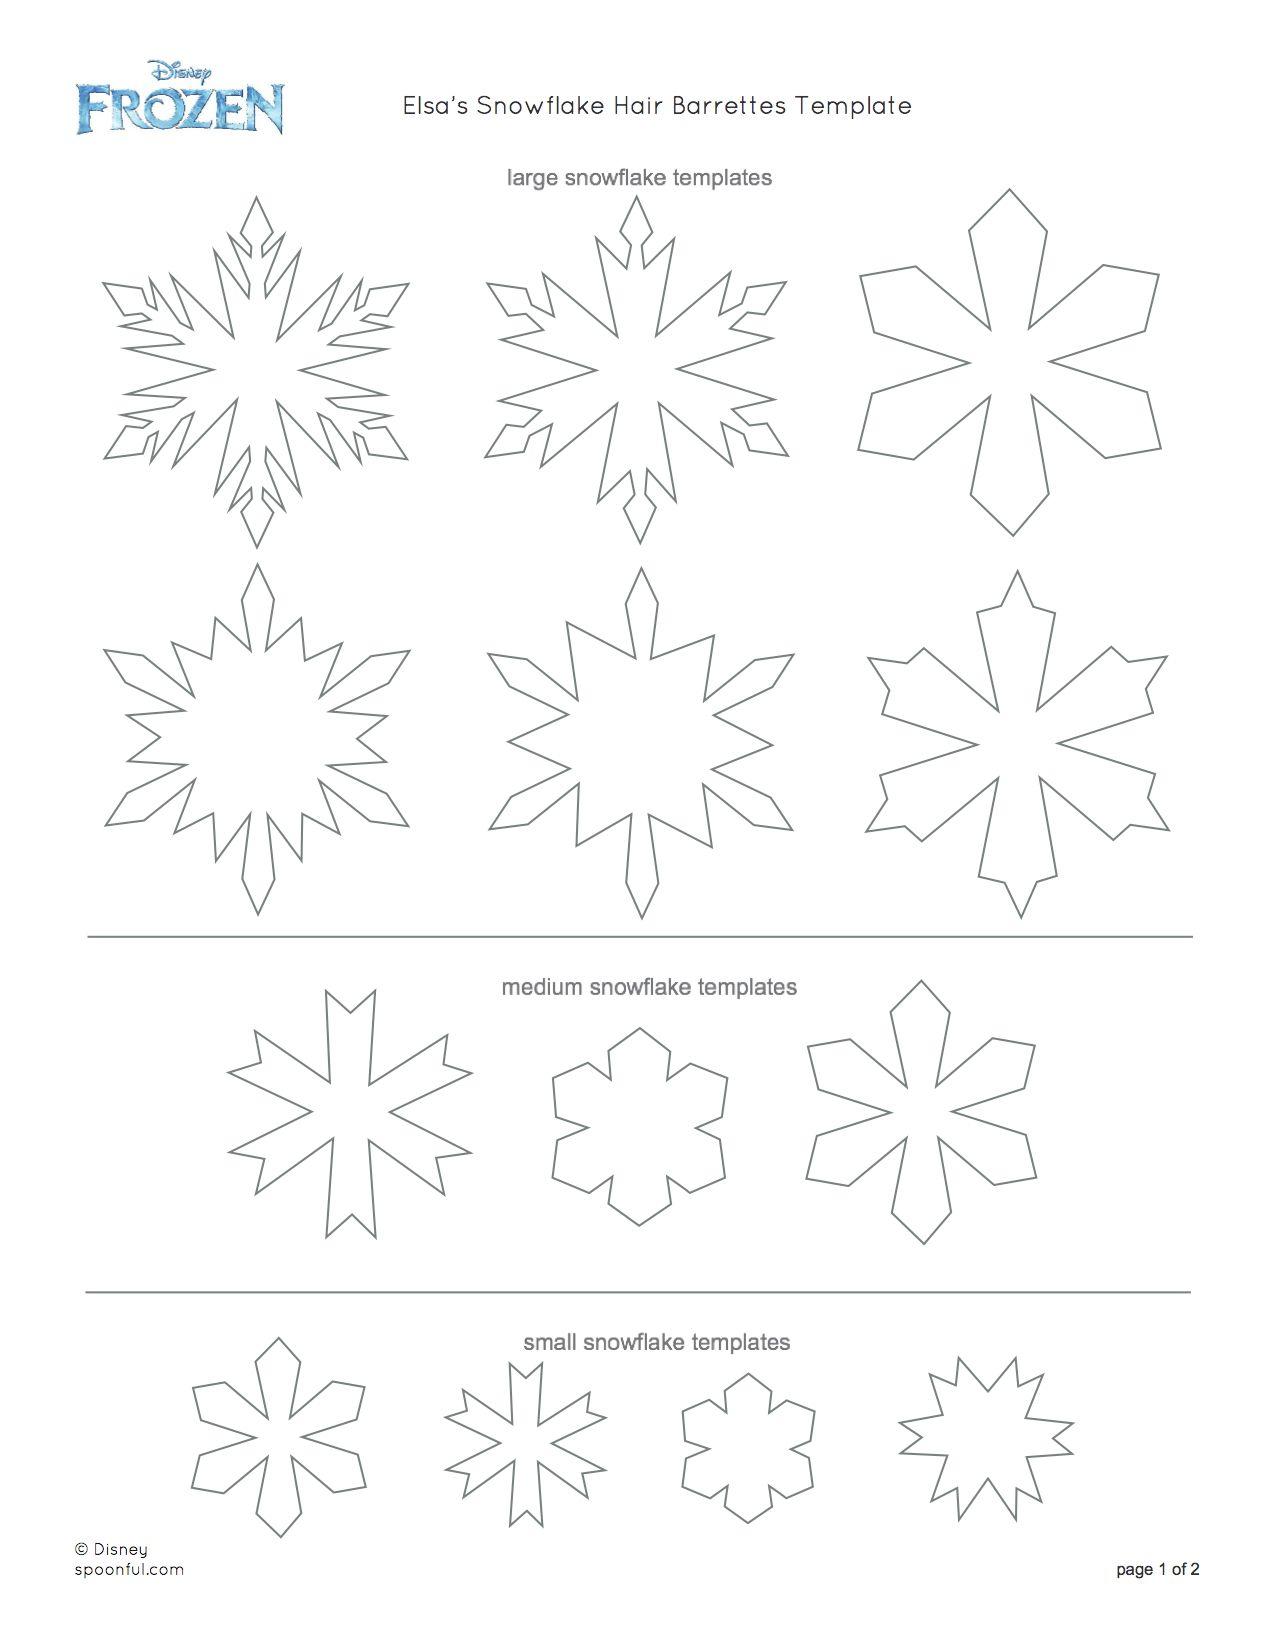 Disney-Frozen-Elsa-Snowflake-Hair-Barrettes-Printable-0813 - Disney - Free Printable Snowflake Patterns